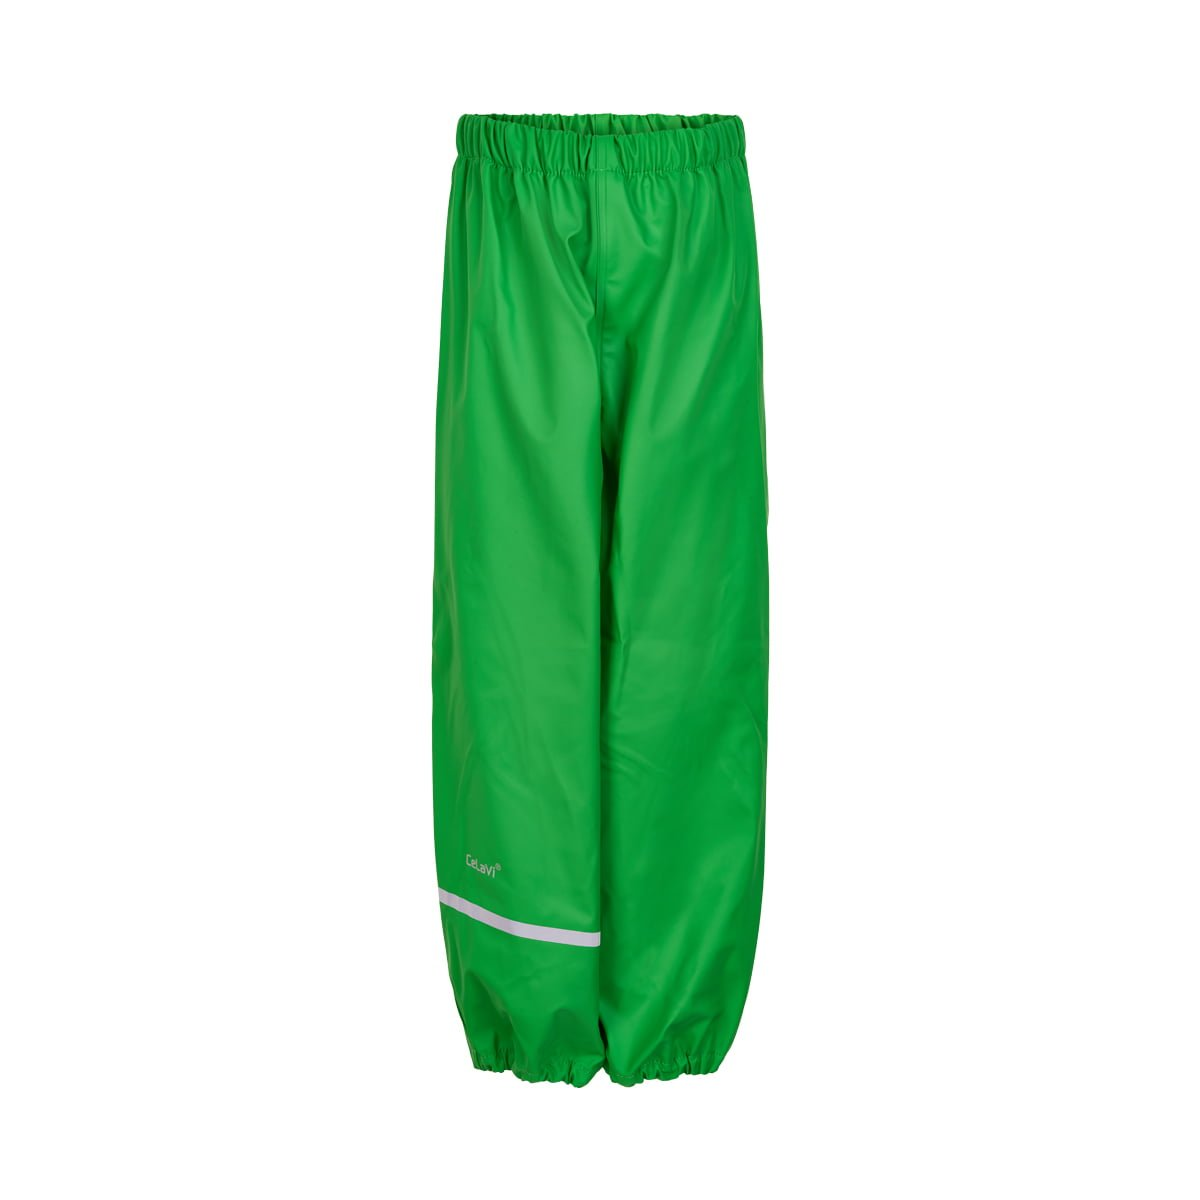 Pantaloni de ploaie și vânt (impermeabil) green CeLaVi 1